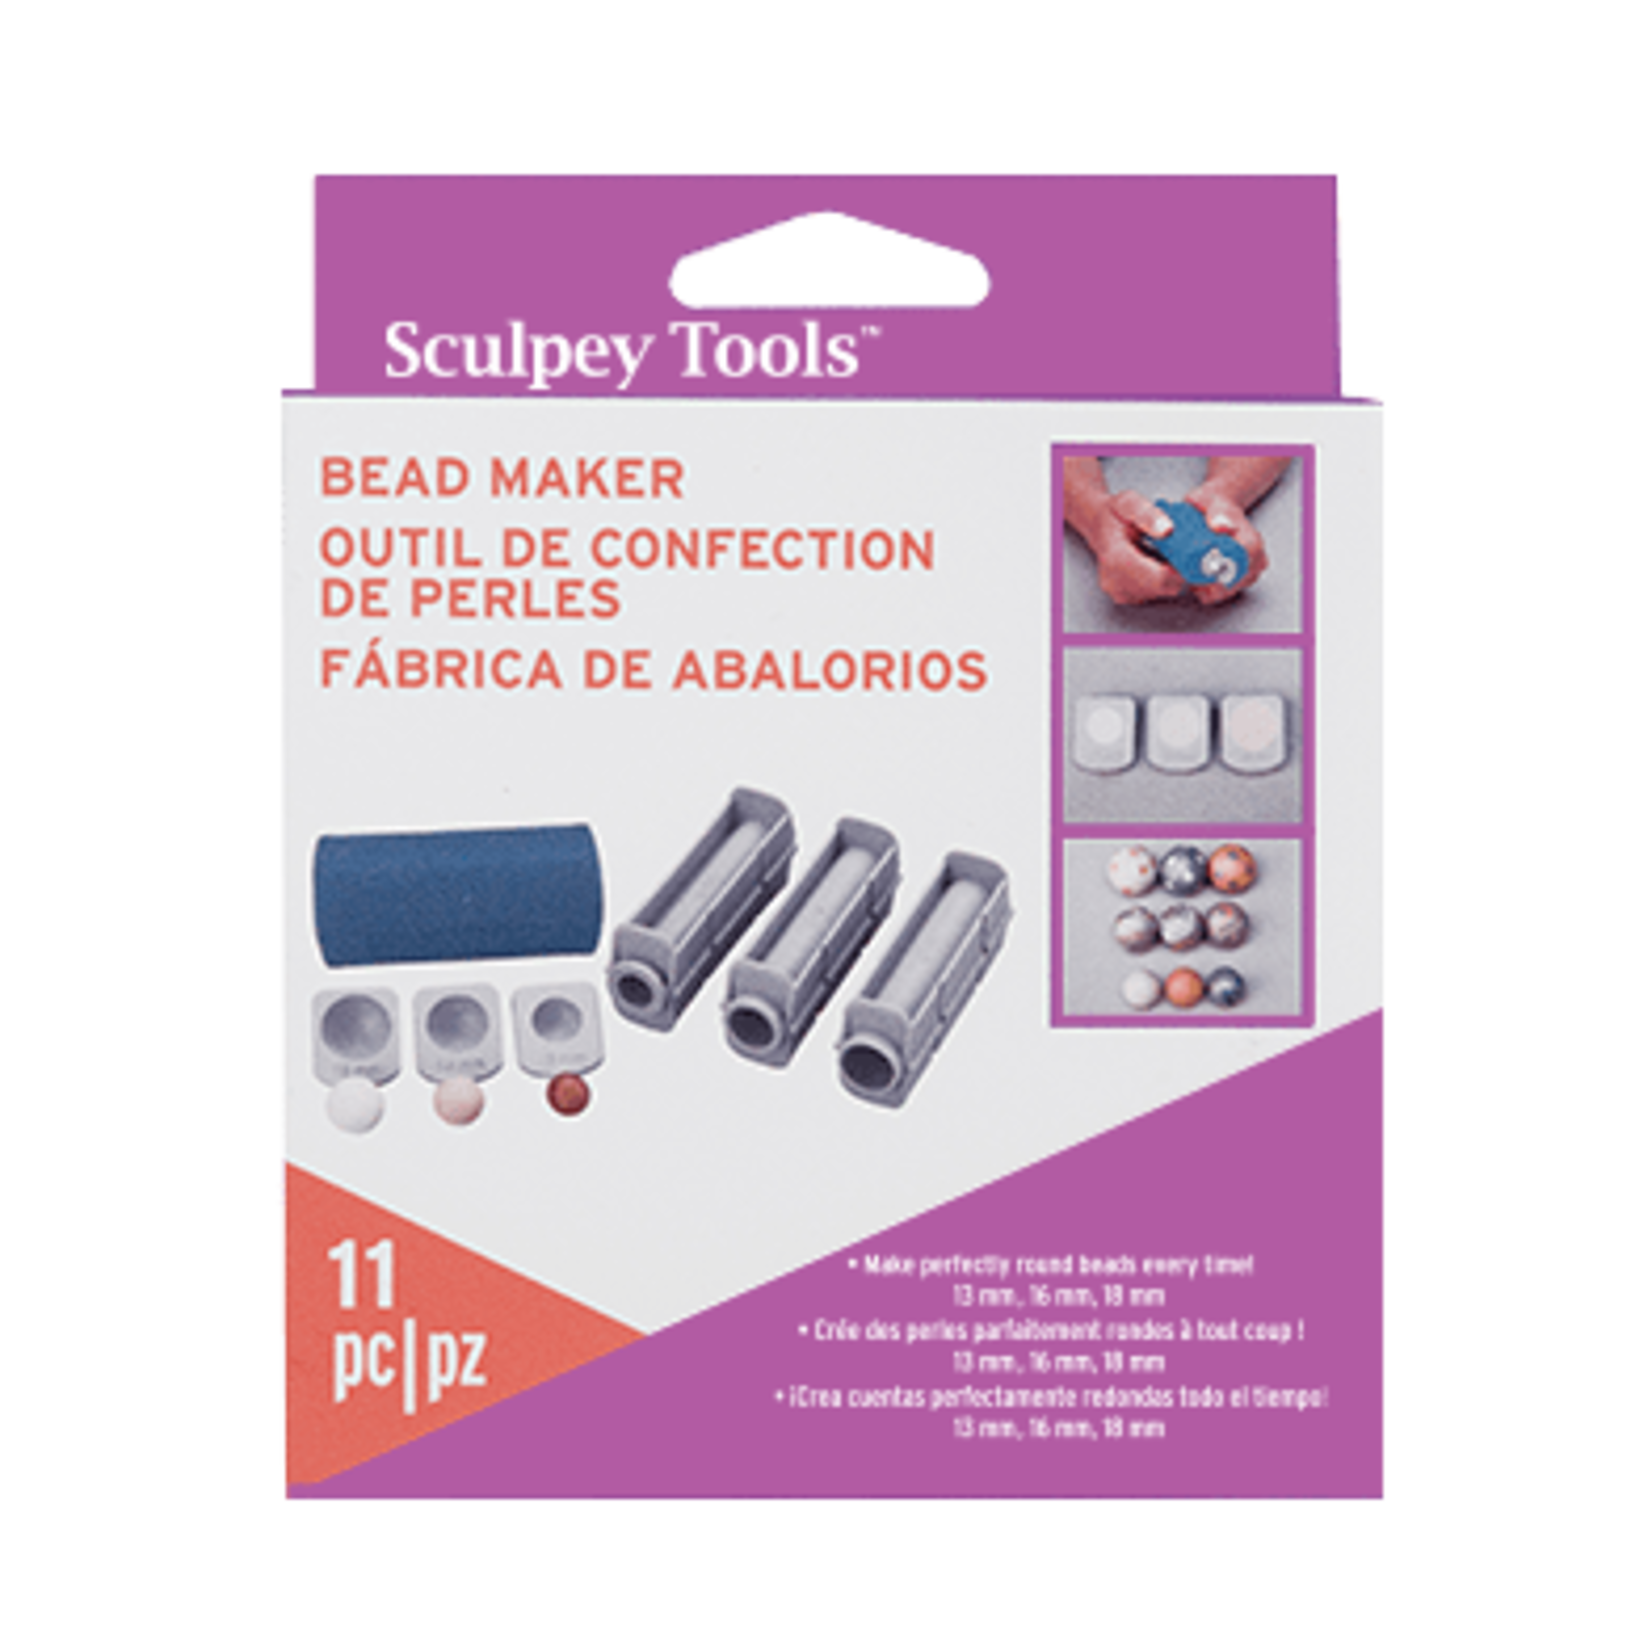 Sculpey Sculpey Bead Maker